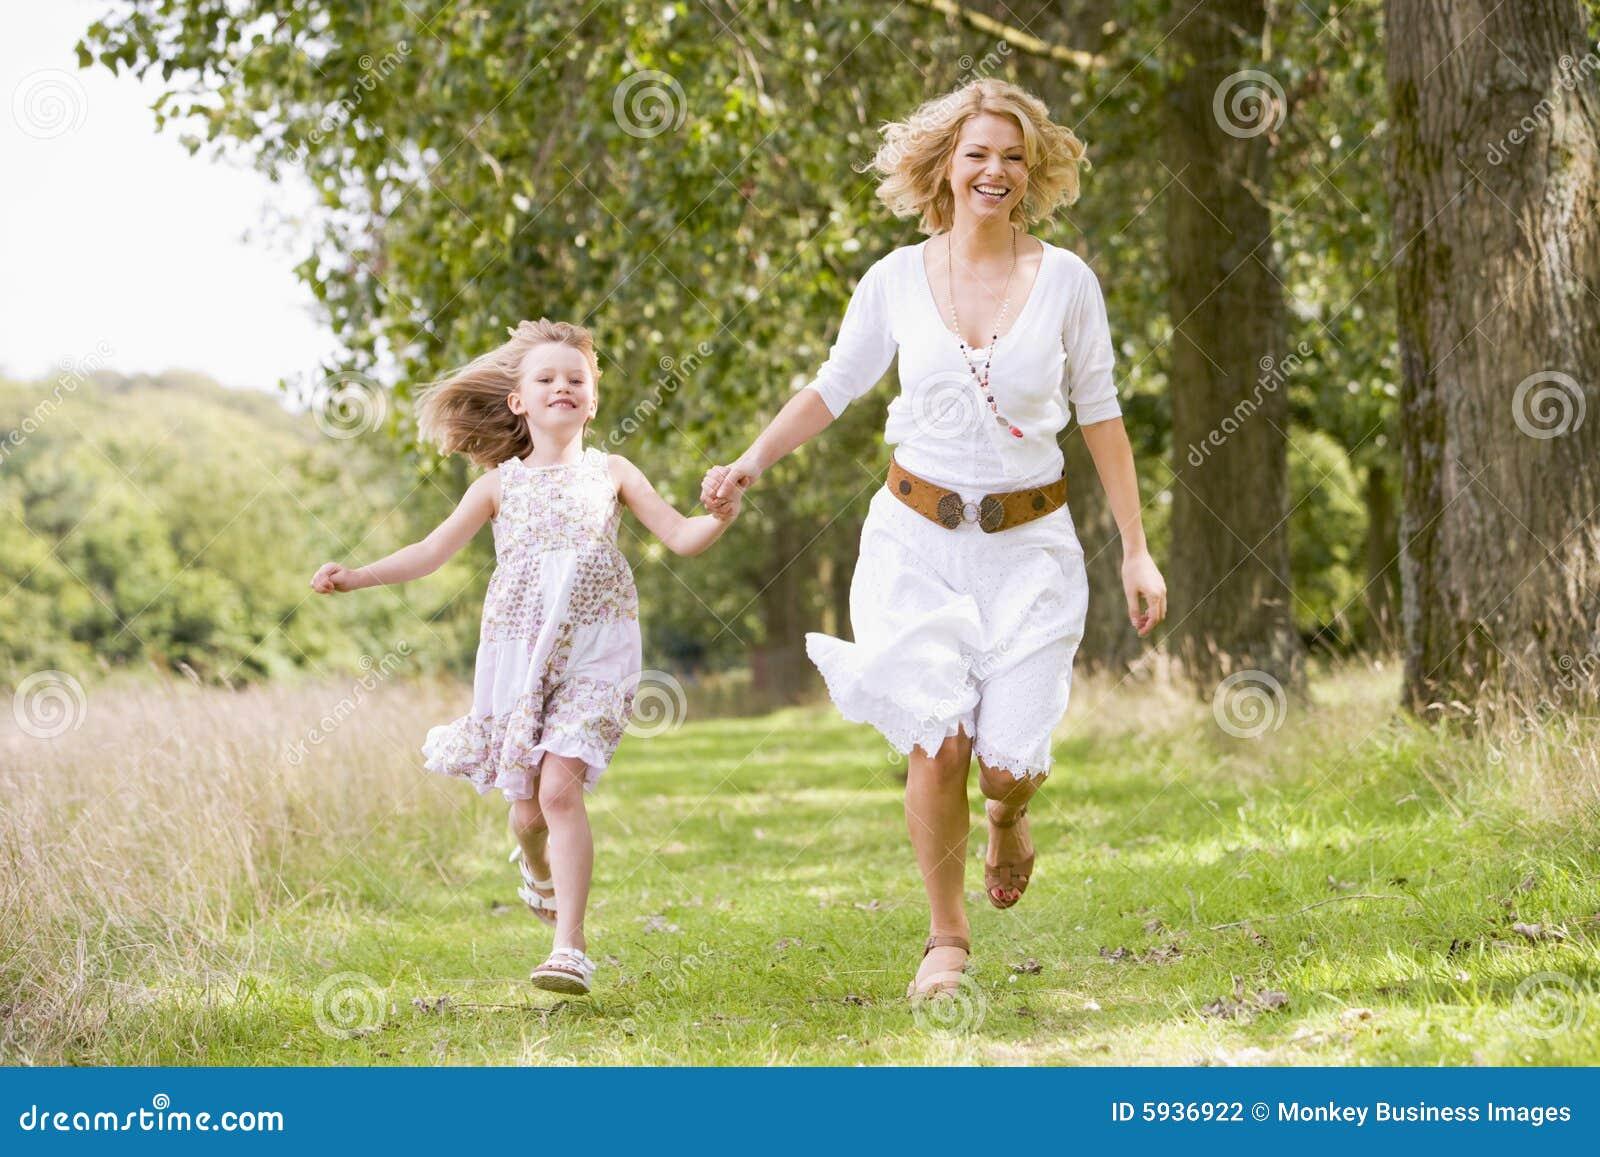 Мама с ребенком идут фото